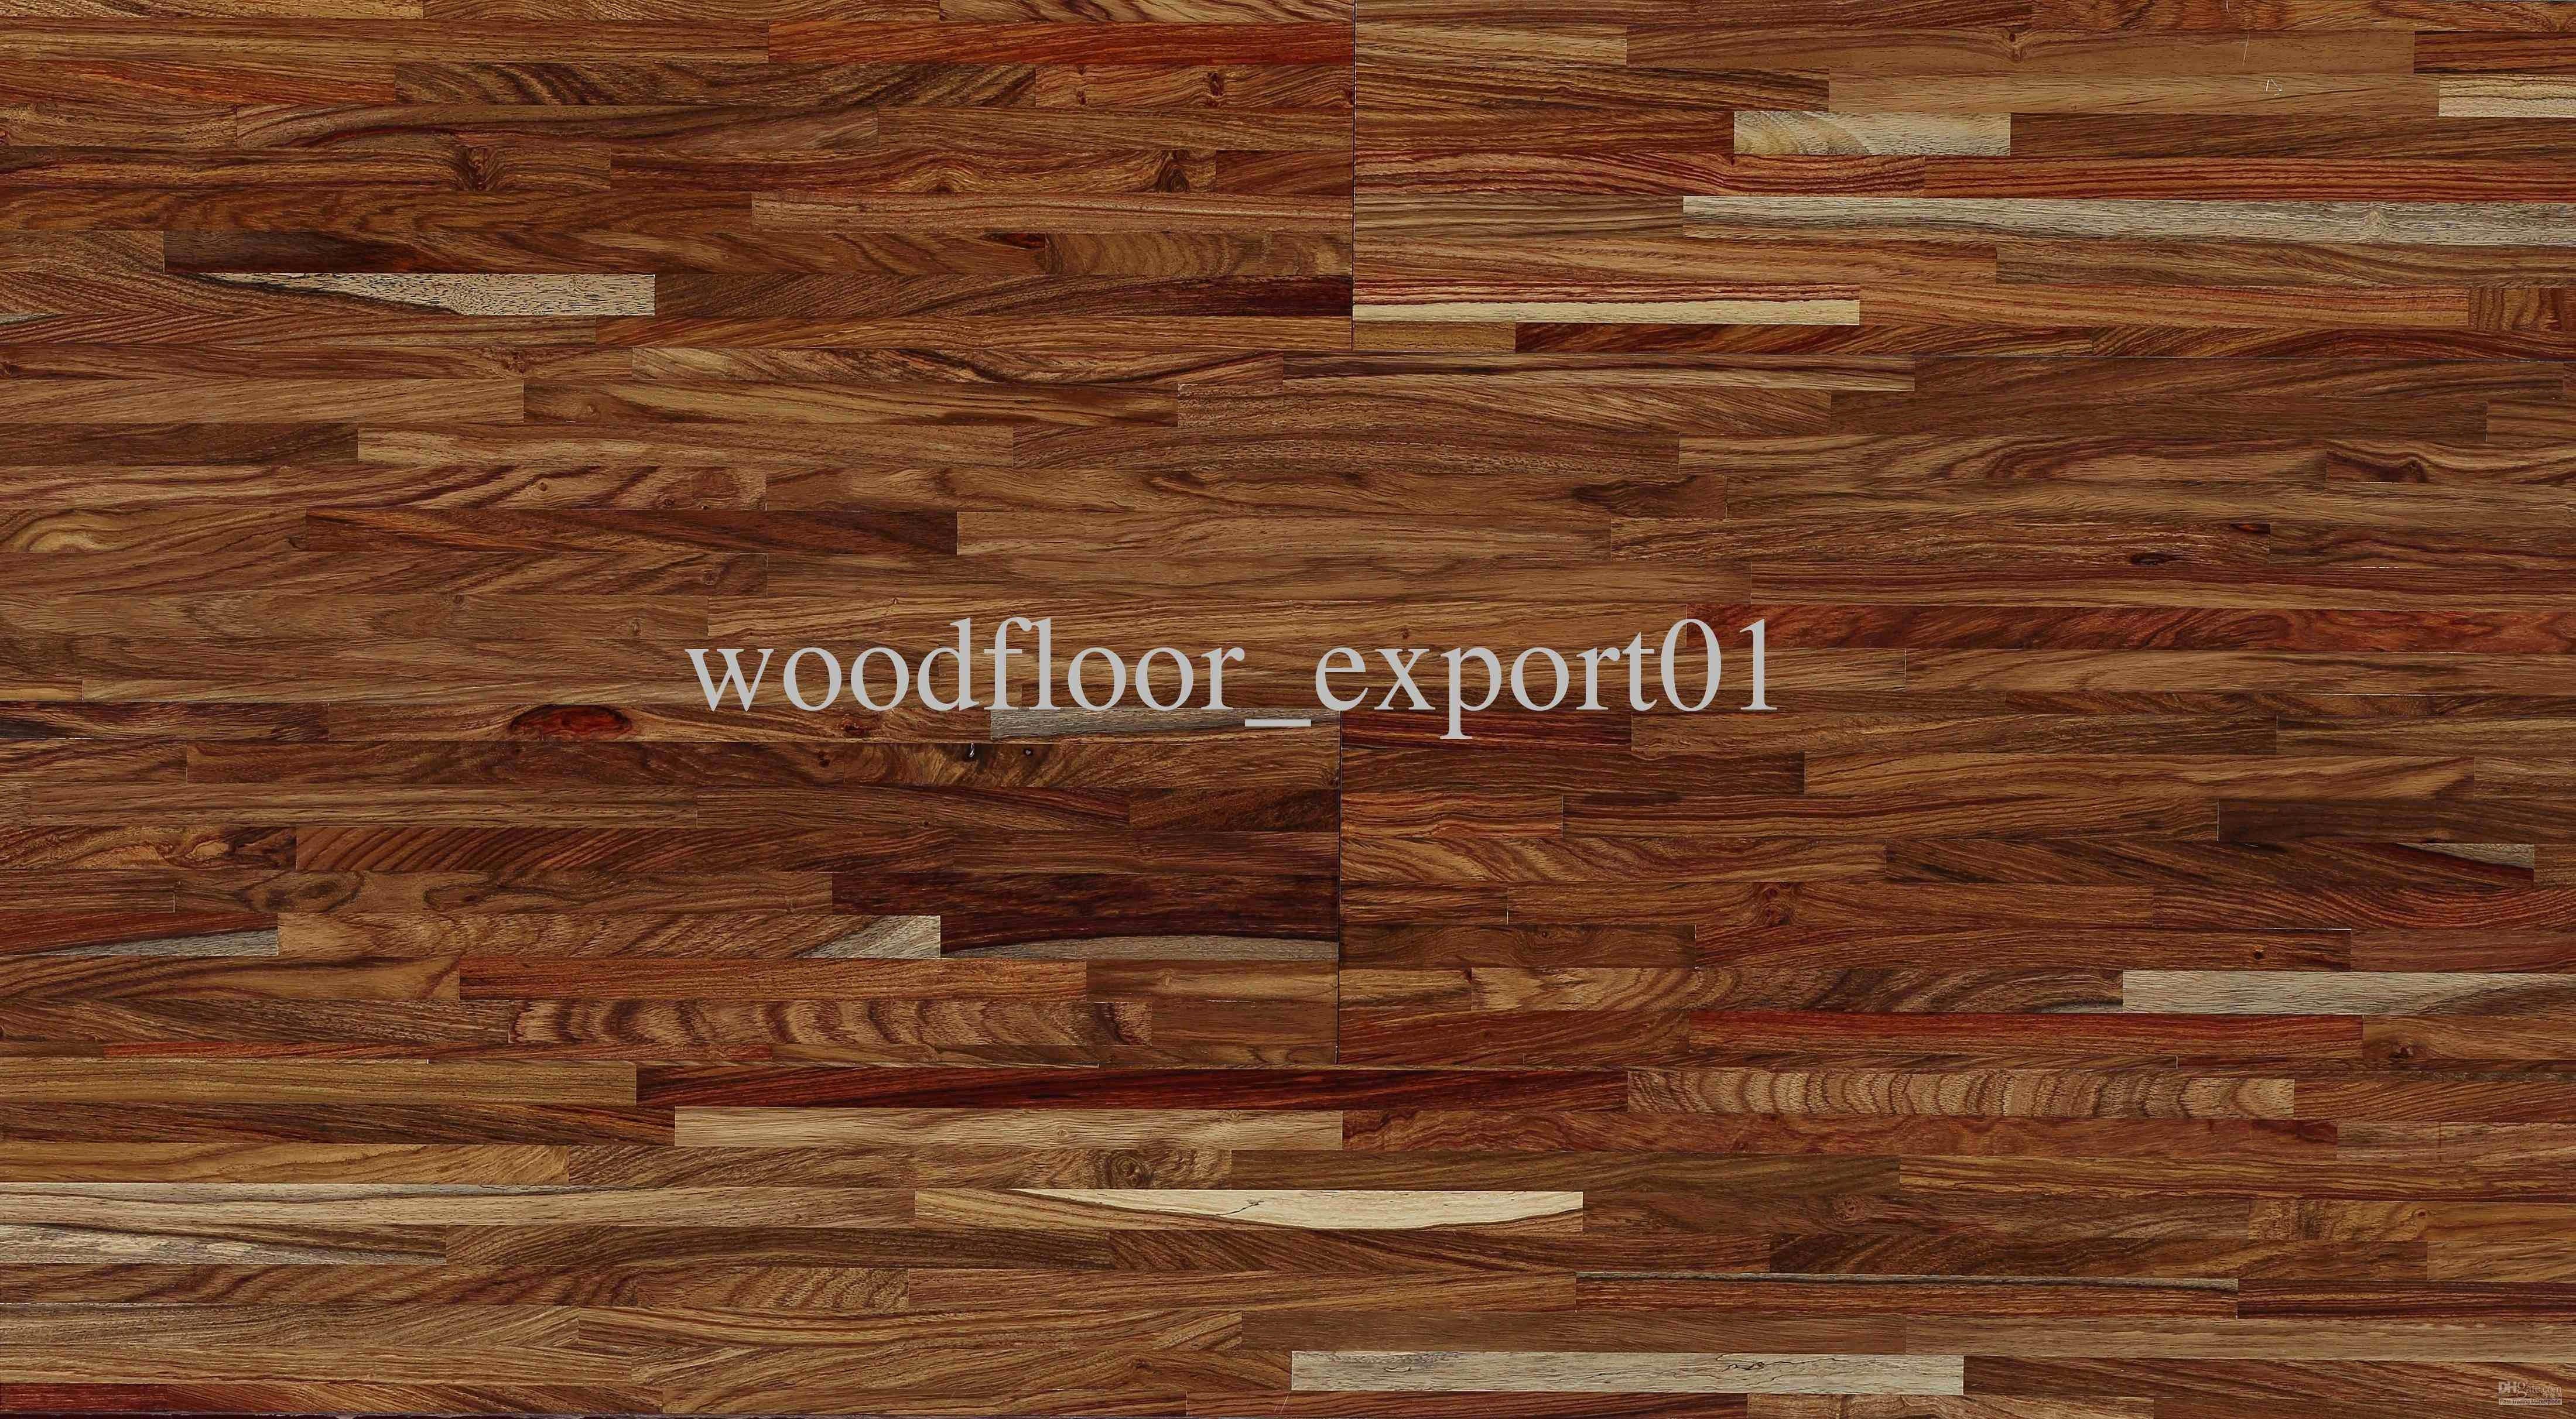 hardwood flooring types of wood of 15 unique types of hardwood flooring image dizpos com pertaining to types of hardwood flooring awesome 50 inspirational sanding and refinishing hardwood floors graphics image of 15